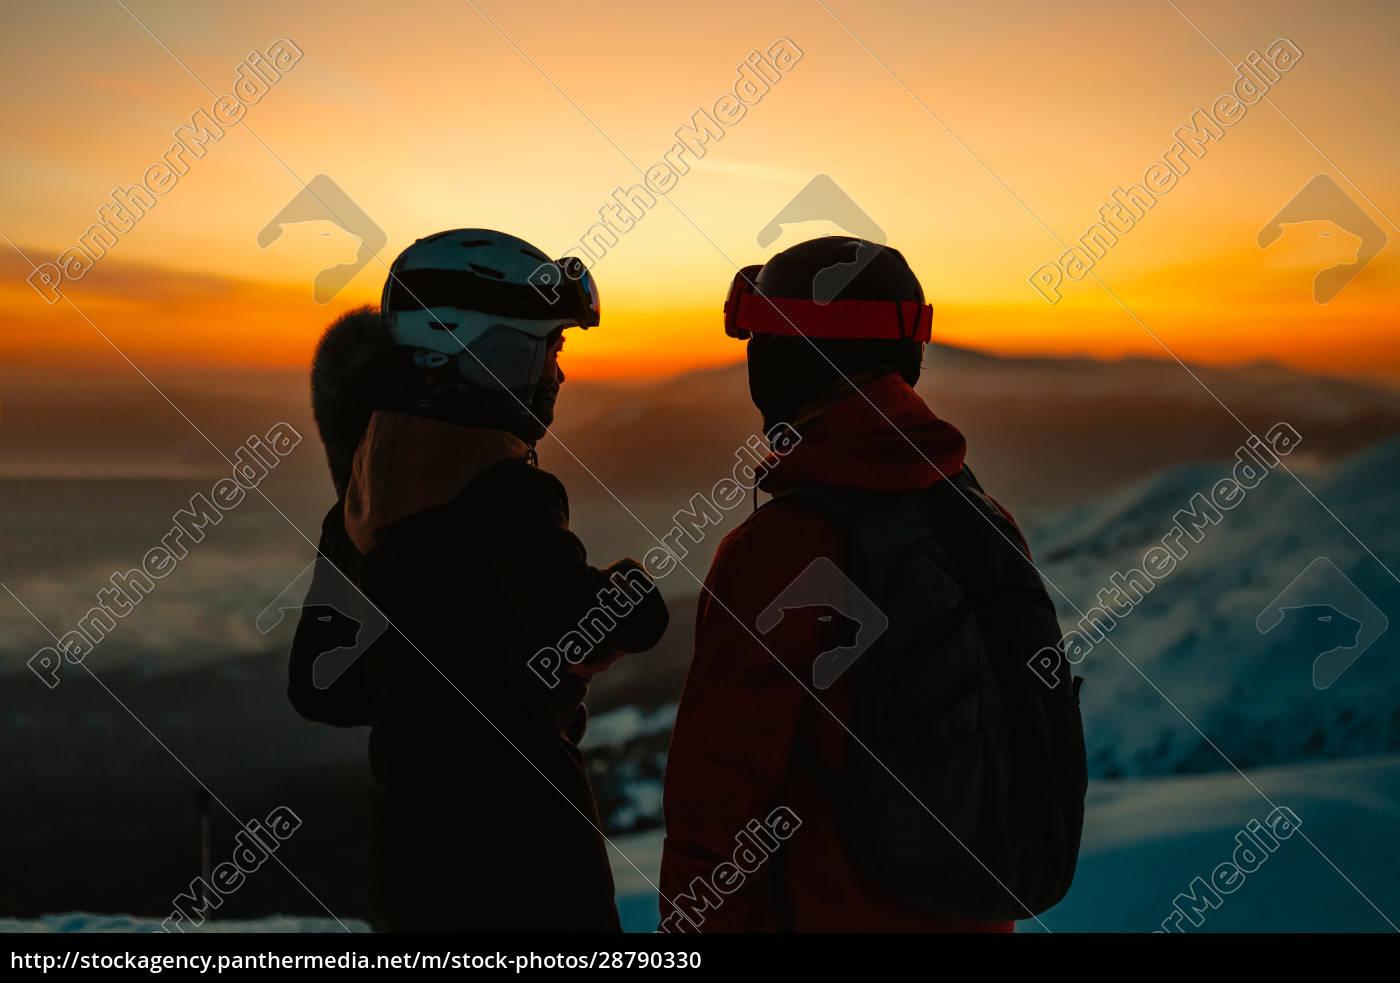 silhouette, of, two, people, wearing, ski - 28790330